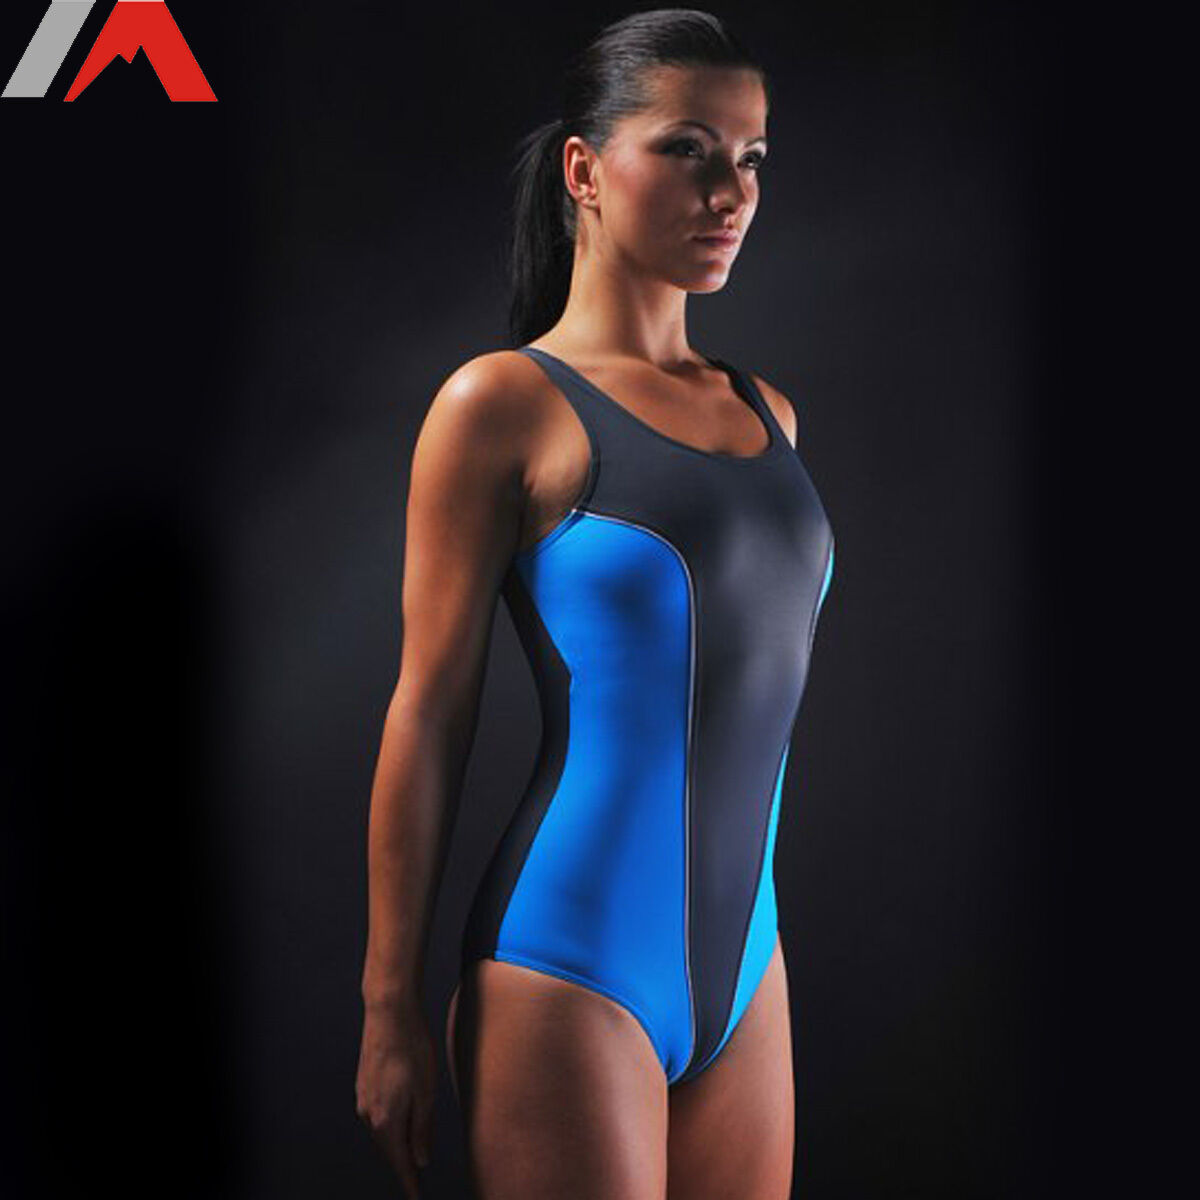 Damen Badeanzug Schwiimmanzug abnehmbare Soft Cups + Unterbrustband